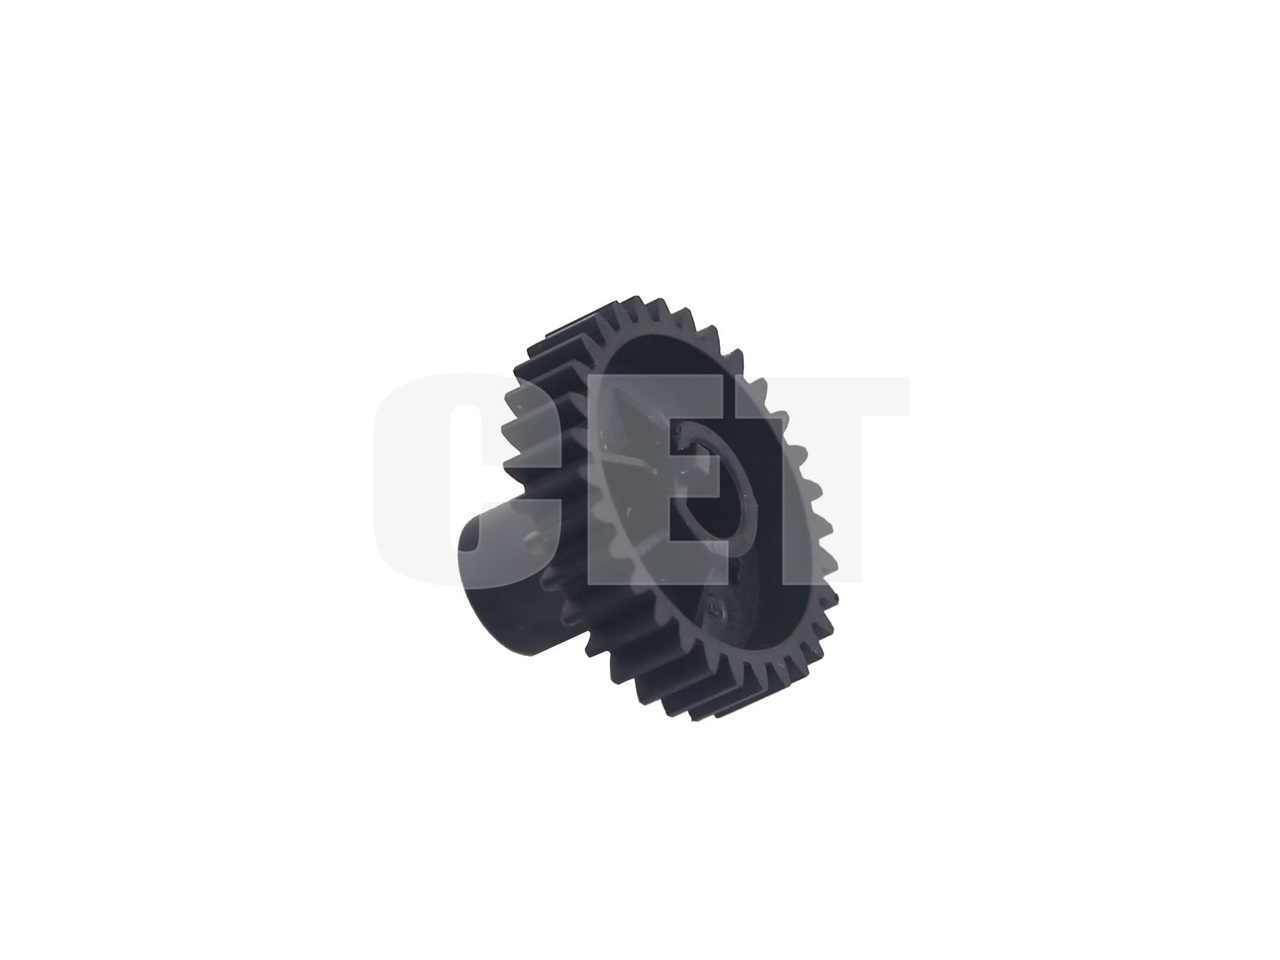 Шестерня резинового вала левая 31T для KYOCERA ECOSYSM2040dn/2135dn/2635dn/P2235dn/2040dn (CET), CET361009